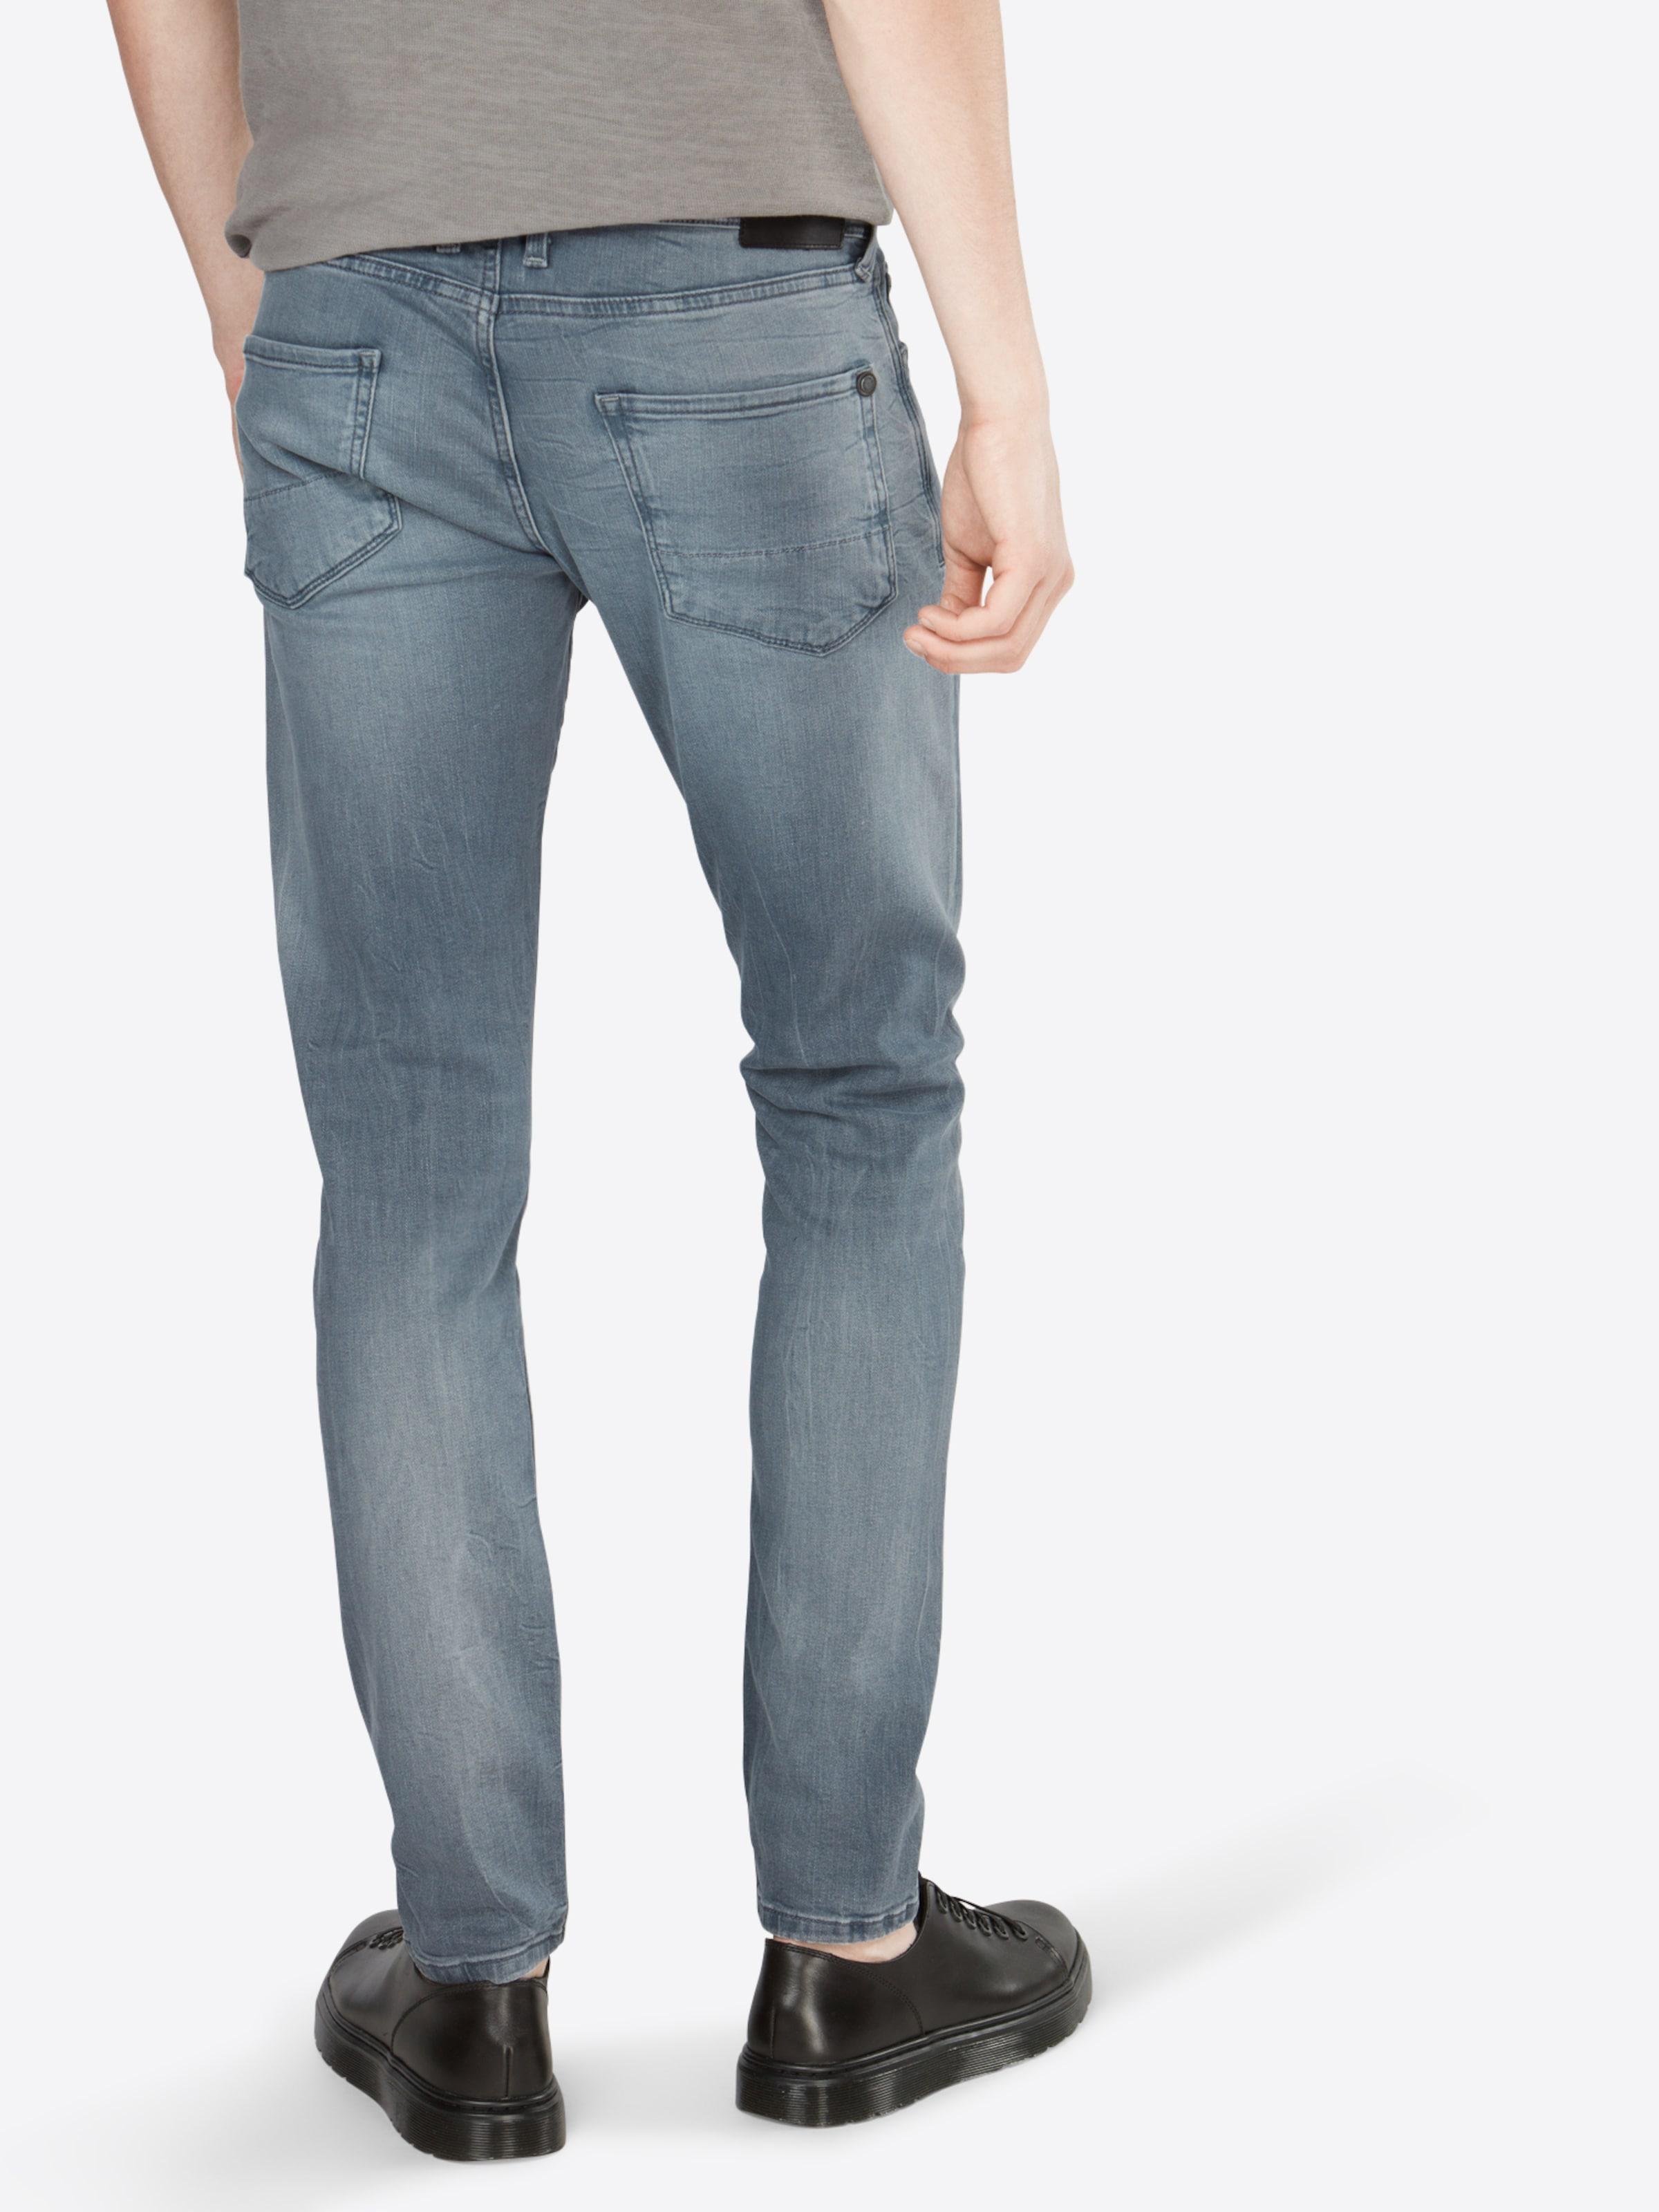 Denim Bleu Pepe Jean 'finsbury' Jeans En zUMVSjLqpG